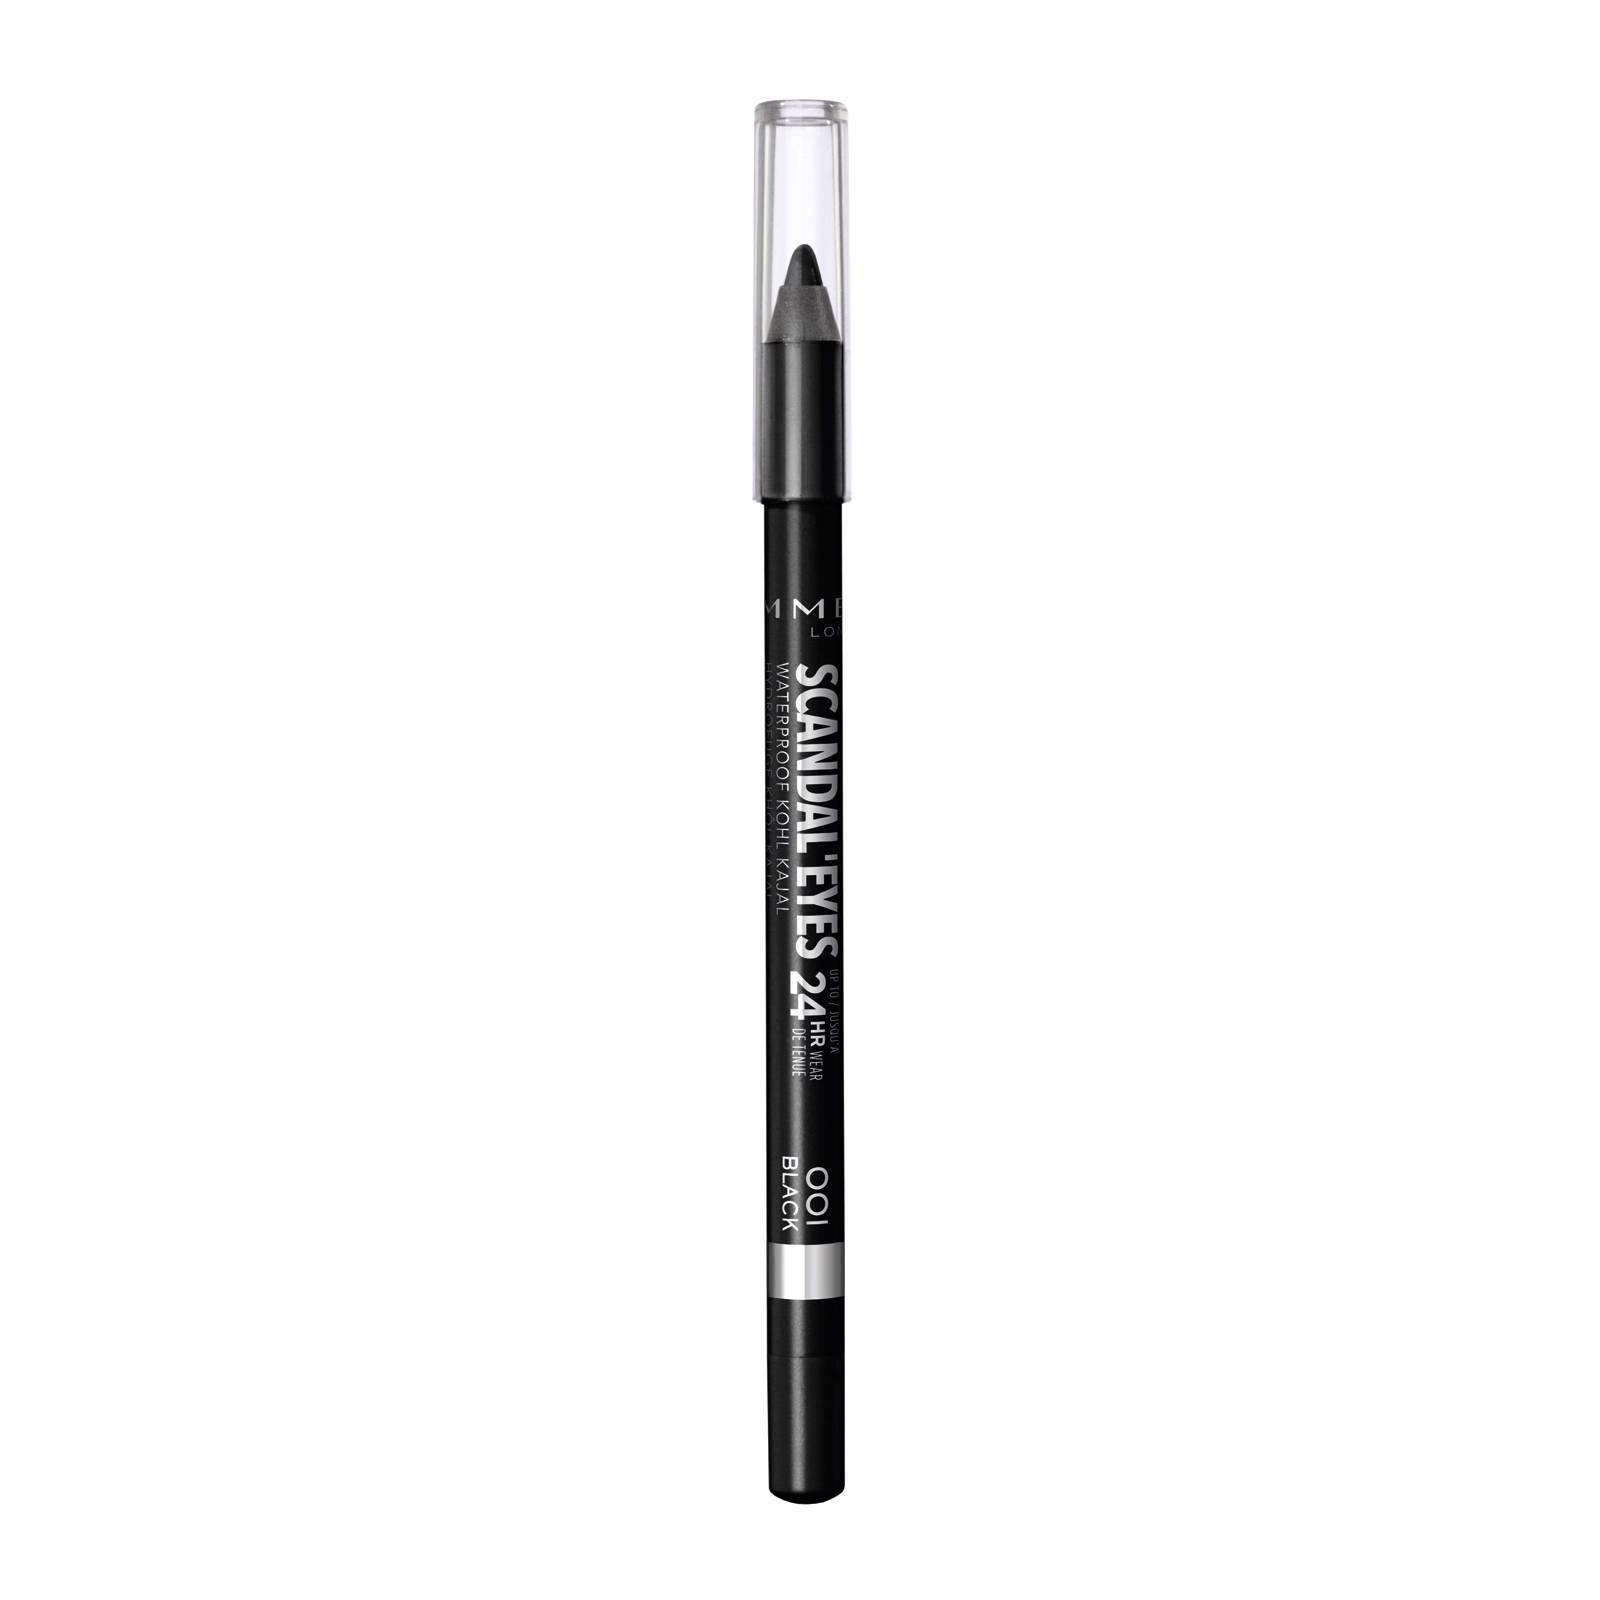 Rimmel London Scandal'Eyes Waterproof Kohl Pencil - zwart